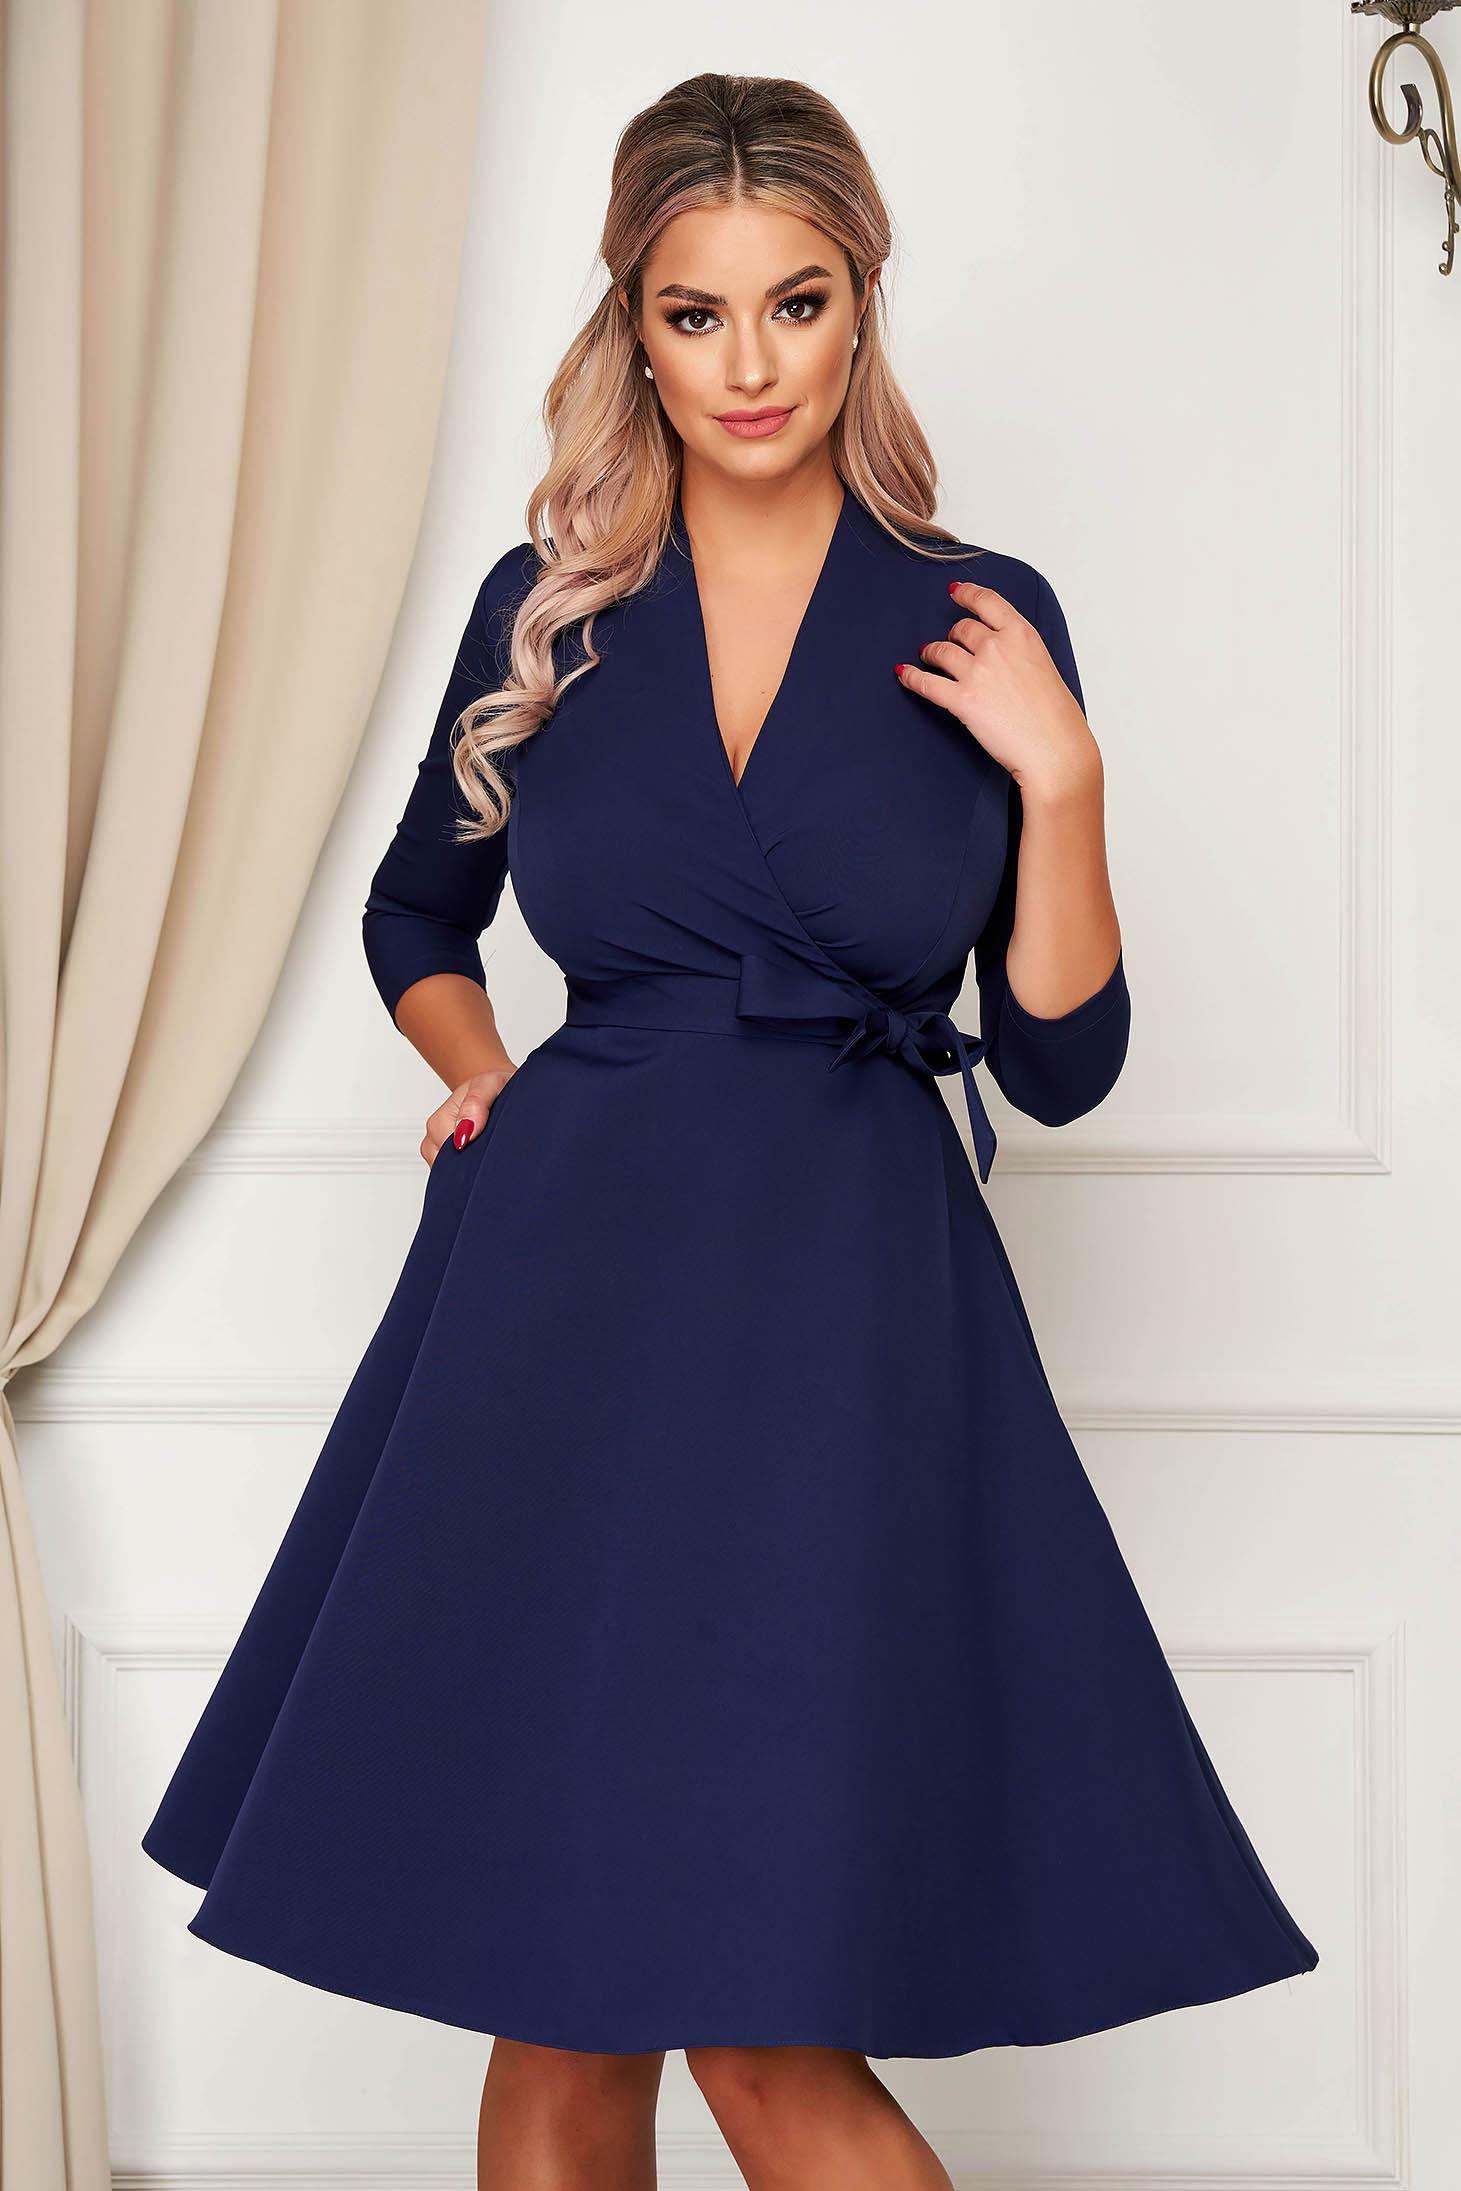 Rochie StarShinerS albastru-inchis eleganta midi in clos din stofa usor elastica cu buzunare